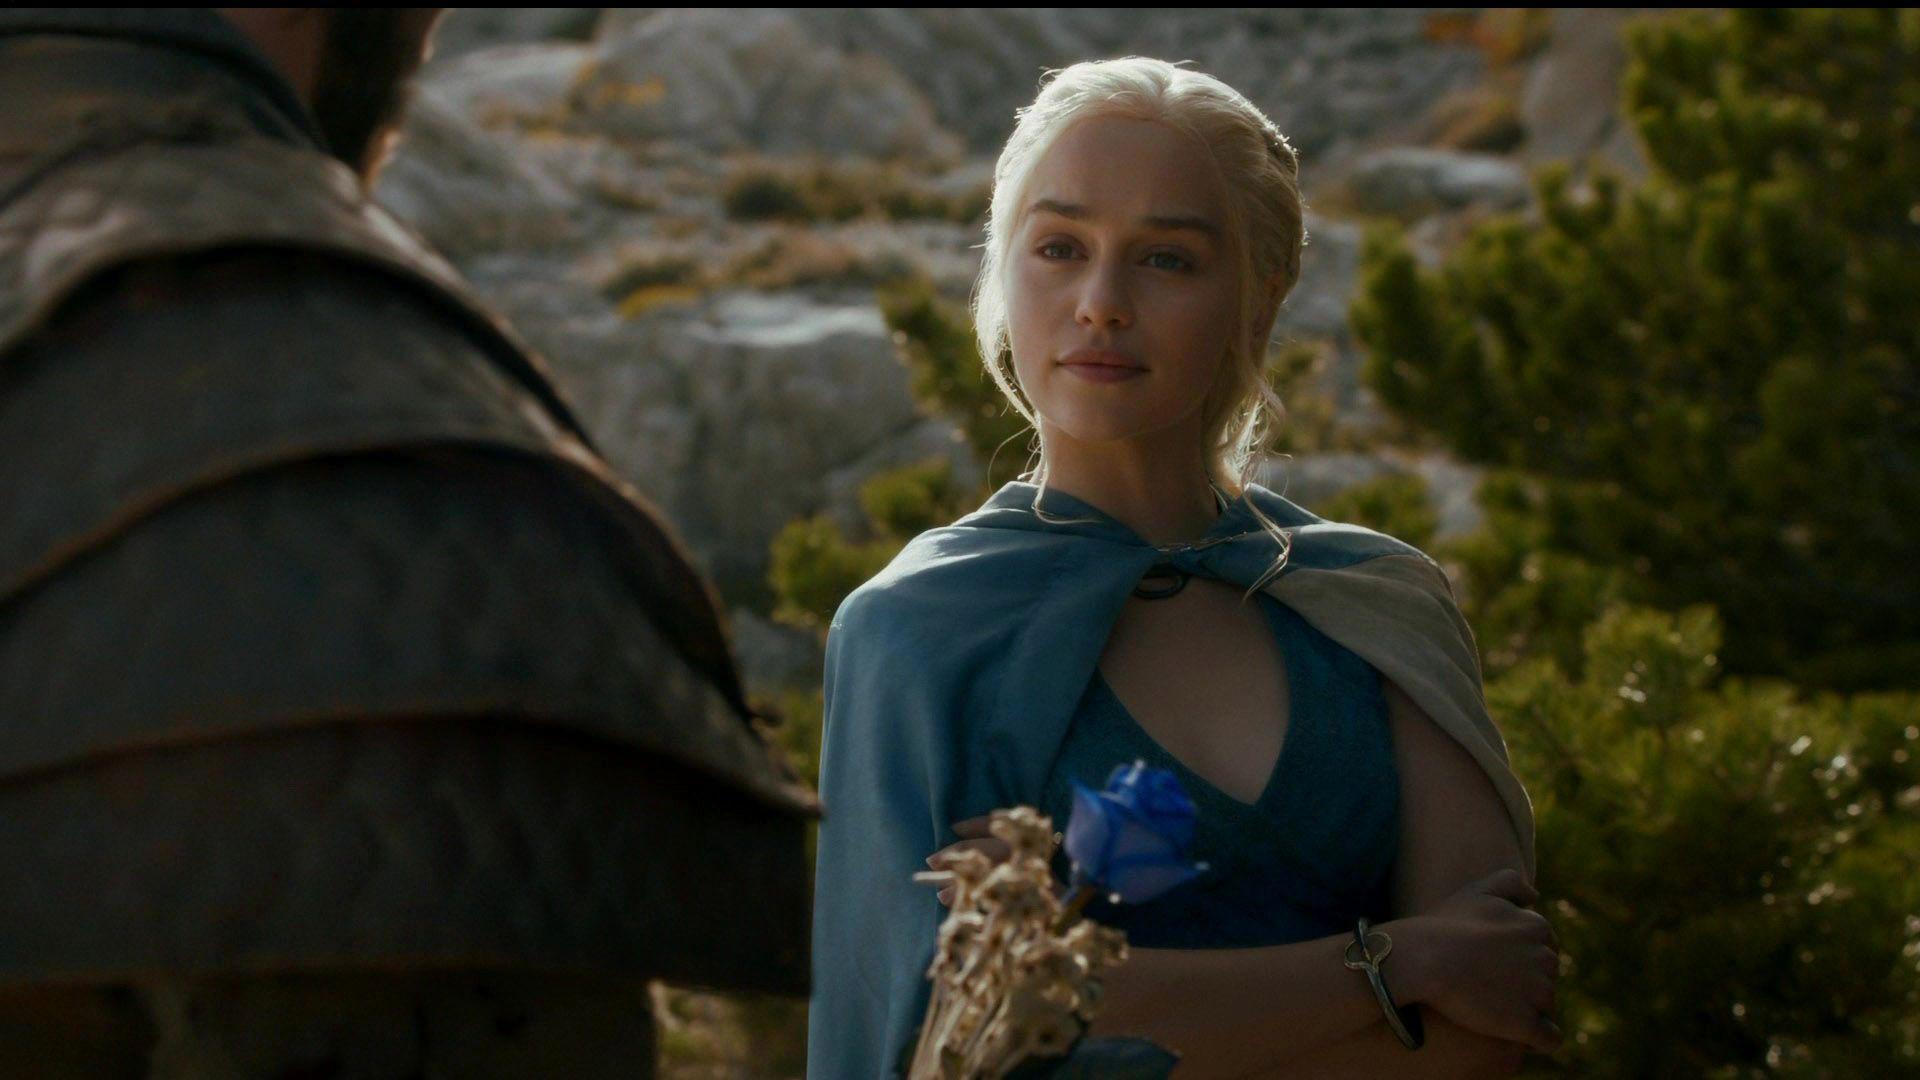 Game Of Thrones Season 2 Dual Audio Hindi Episode 1-10 480p & 720p